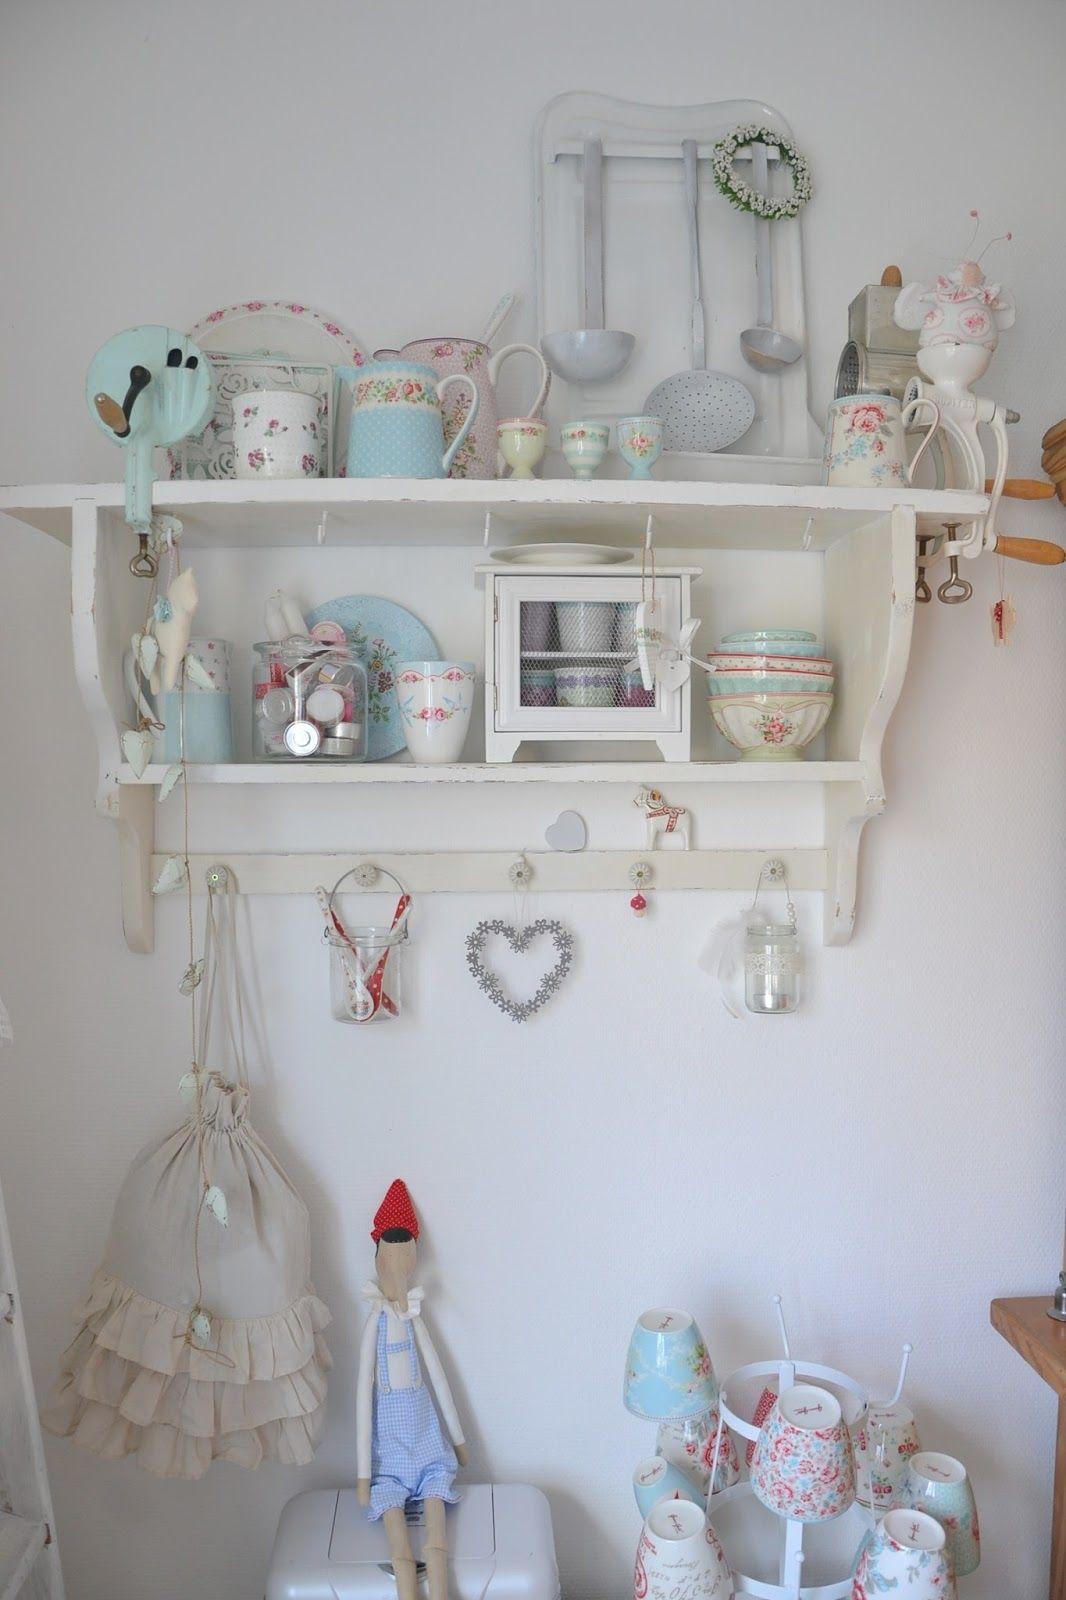 b tree shabby love pinterest deko shabby und shabby chic k che. Black Bedroom Furniture Sets. Home Design Ideas